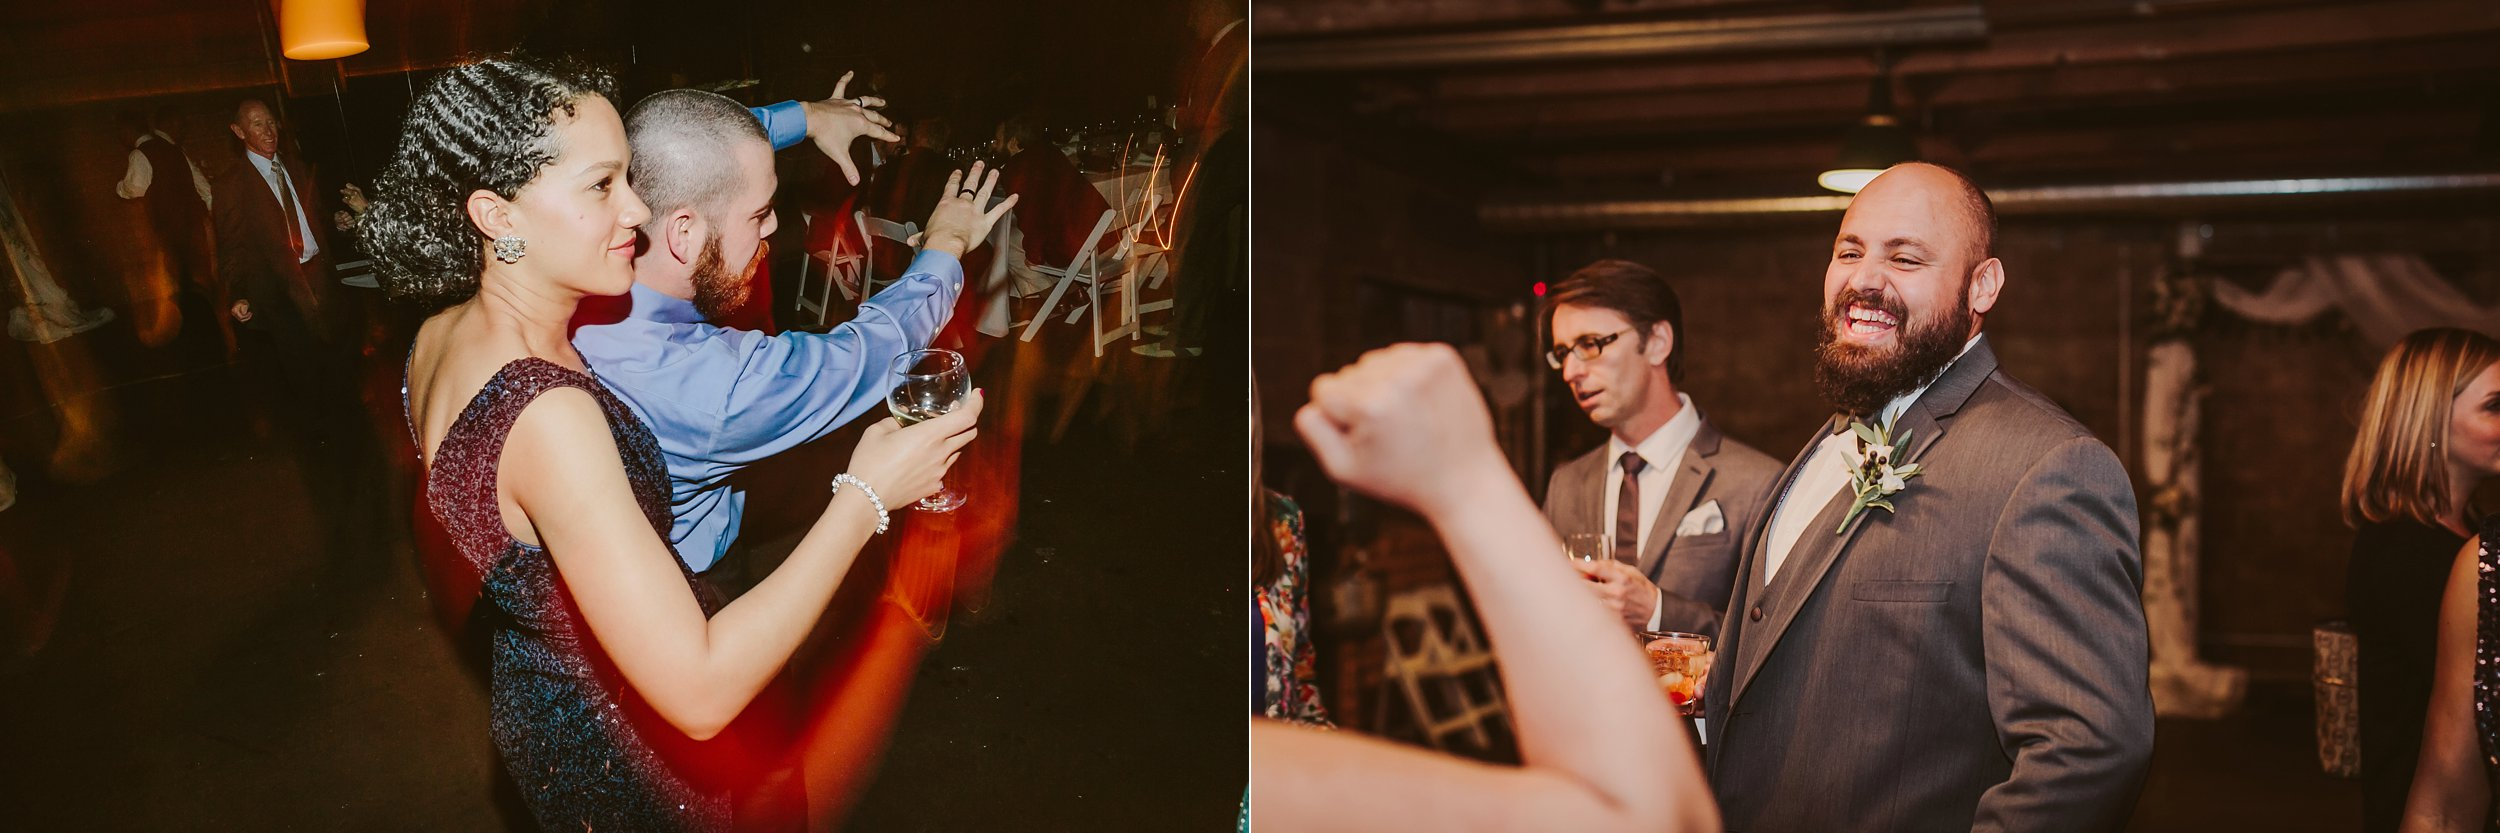 Smoky Hollw Studios Wedding_0045.jpg